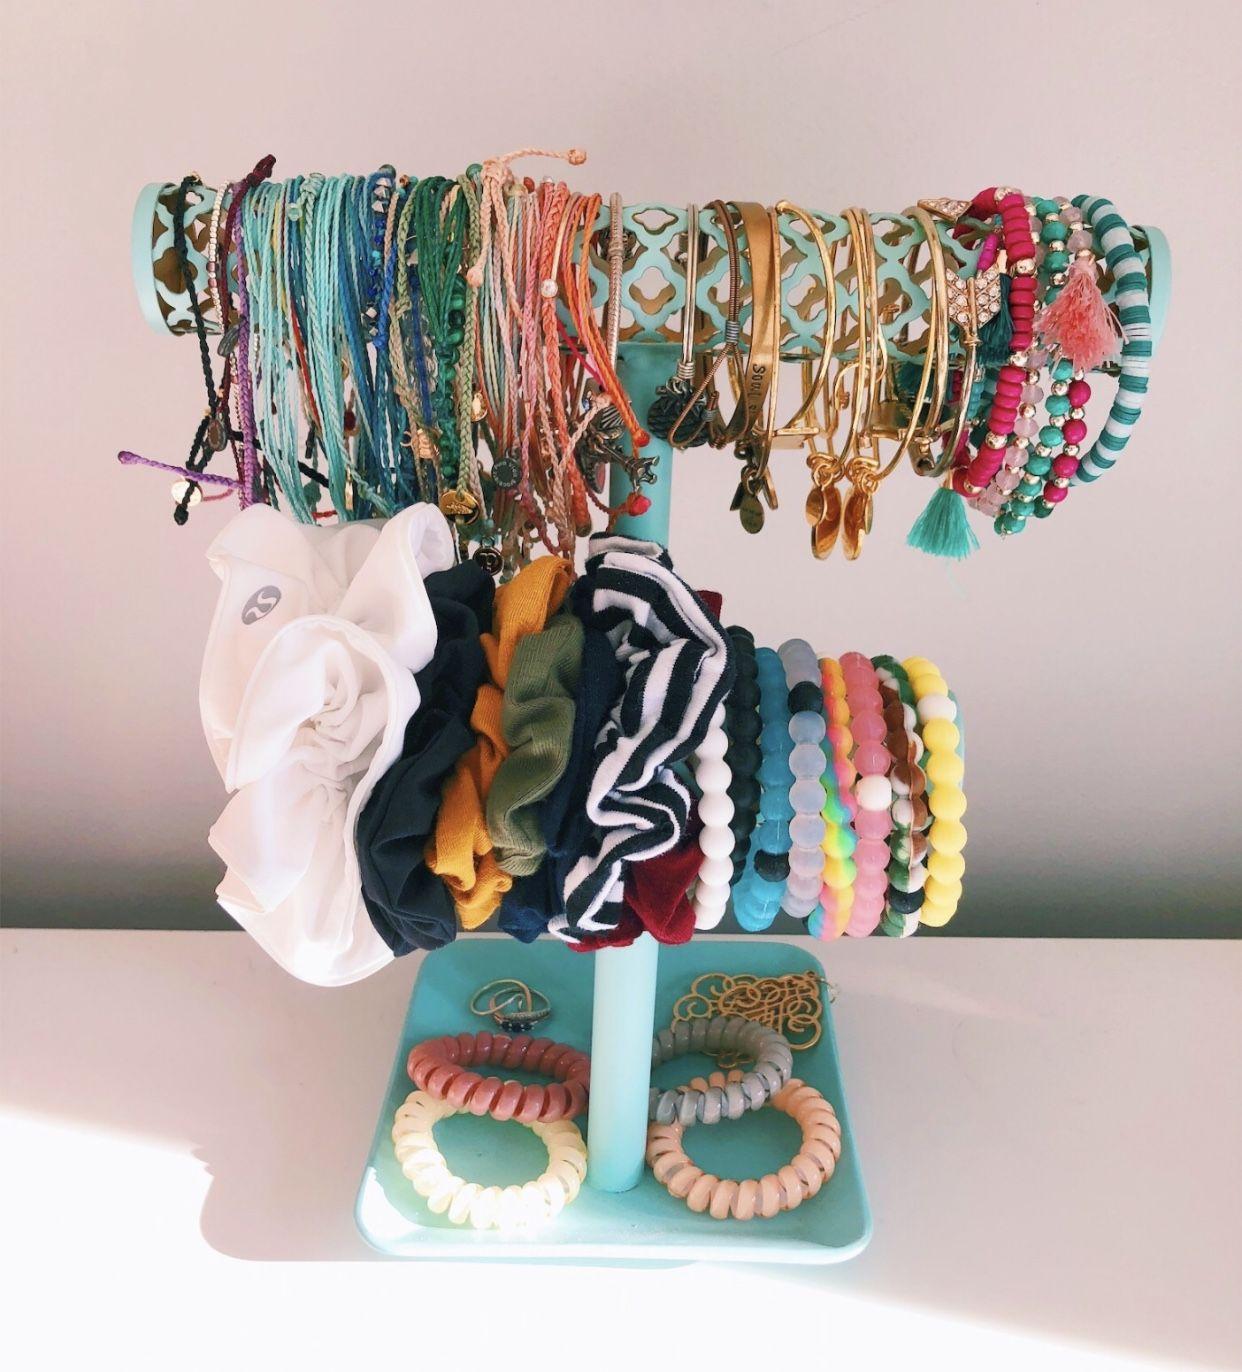 Cute Jewelry, Jewelry, Accessories